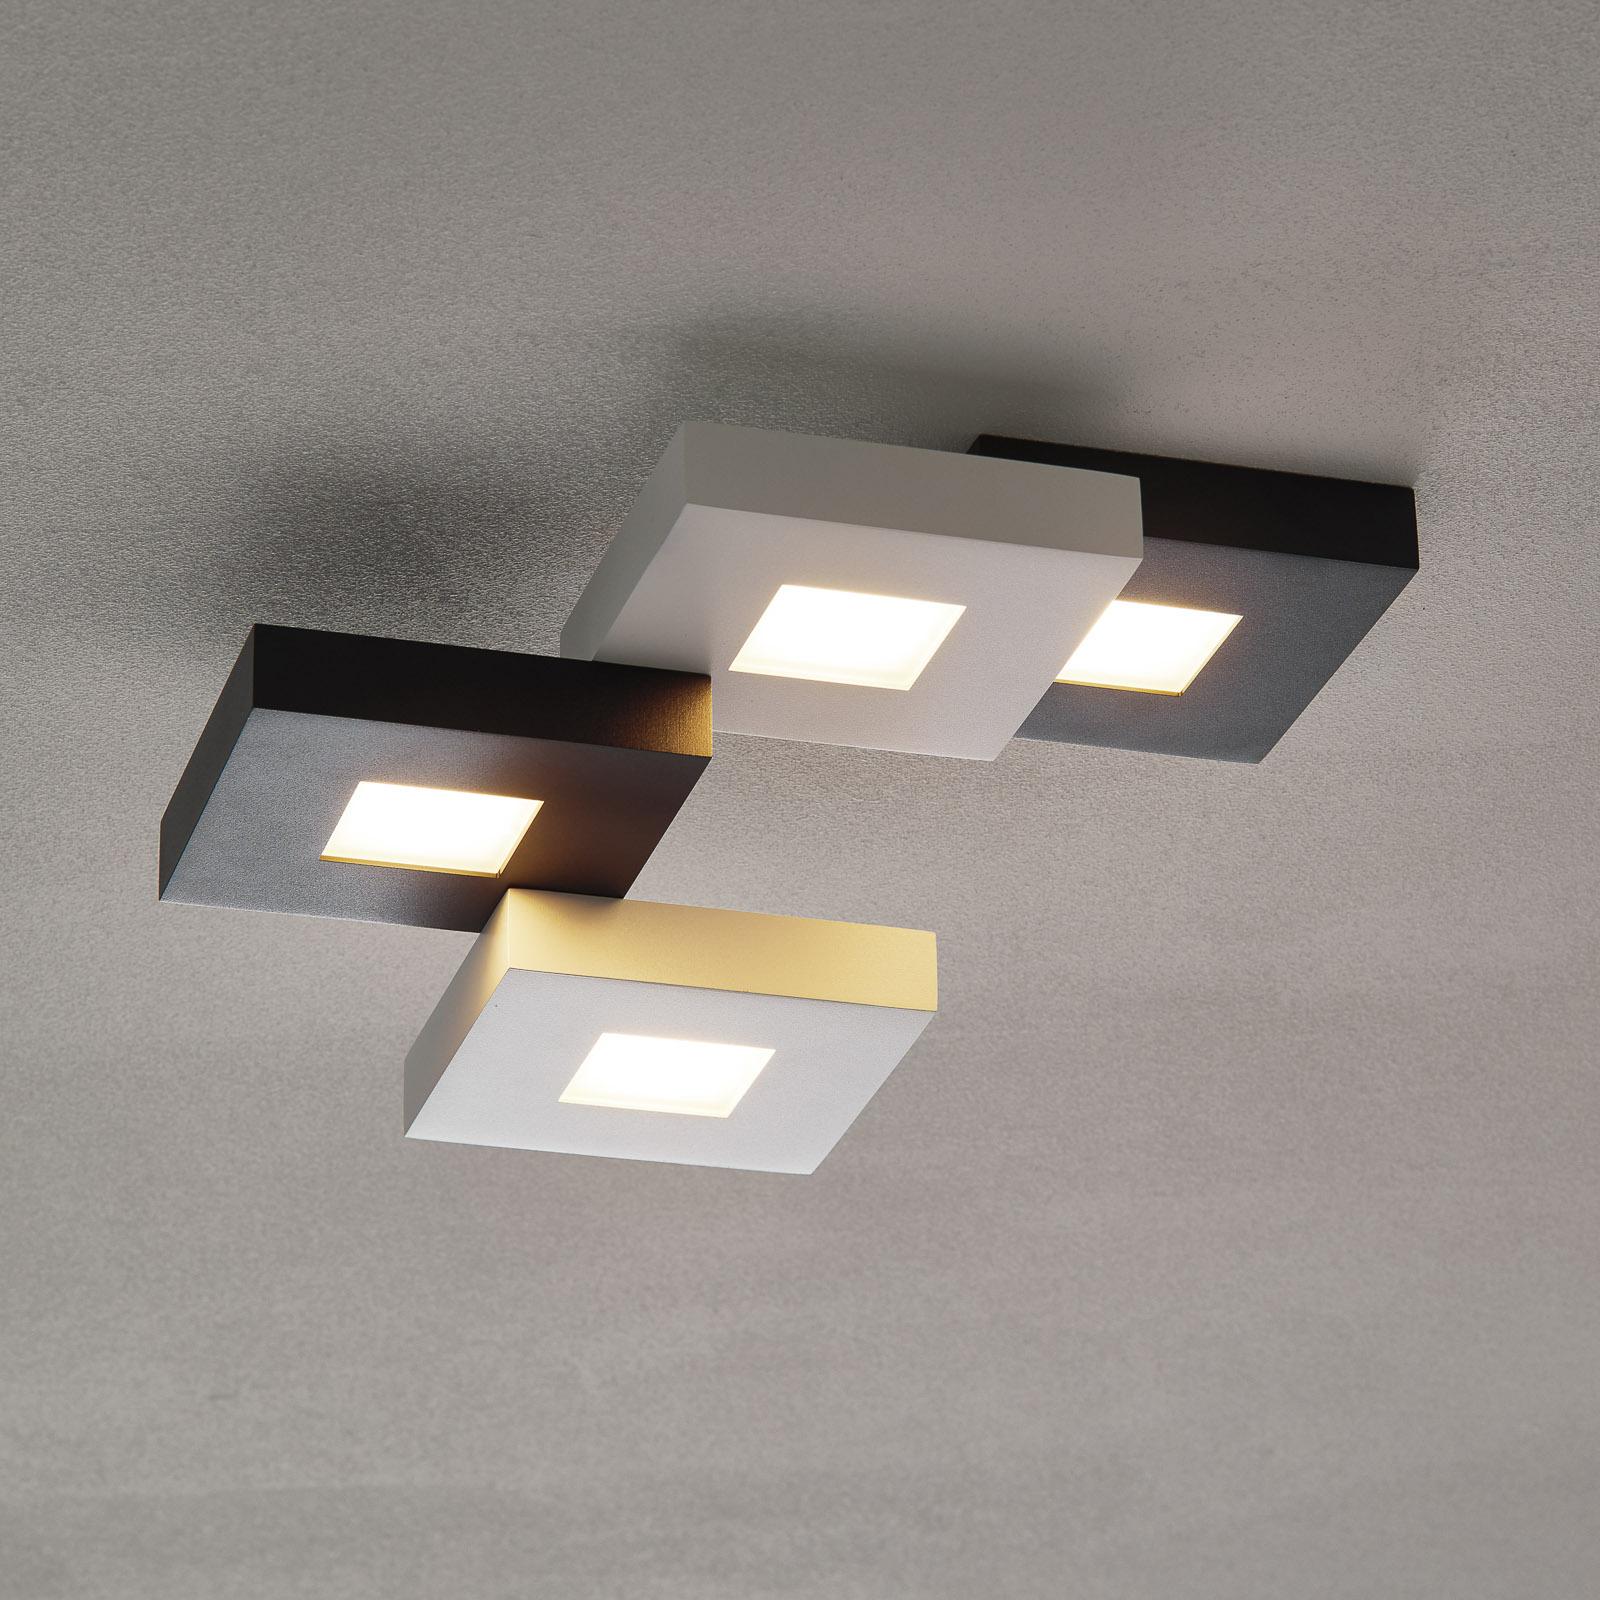 Cubus - lampa sufitowa LED, czarno-biała, 4-pkt.